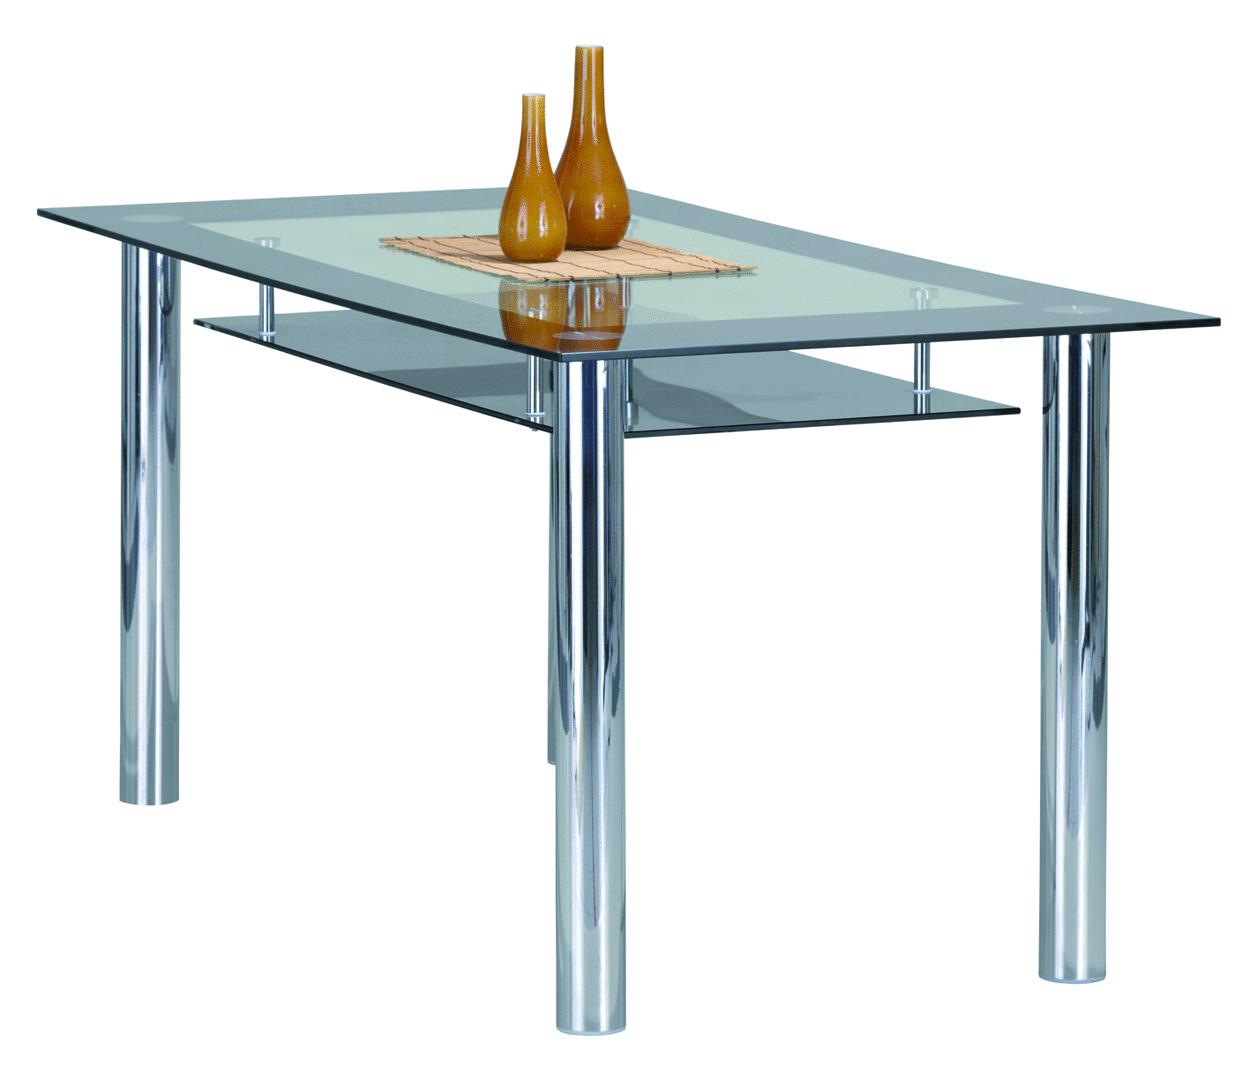 Tavolo cucina dimensioni elegant tavoli da cucina - Dimensioni tavoli da cucina ...